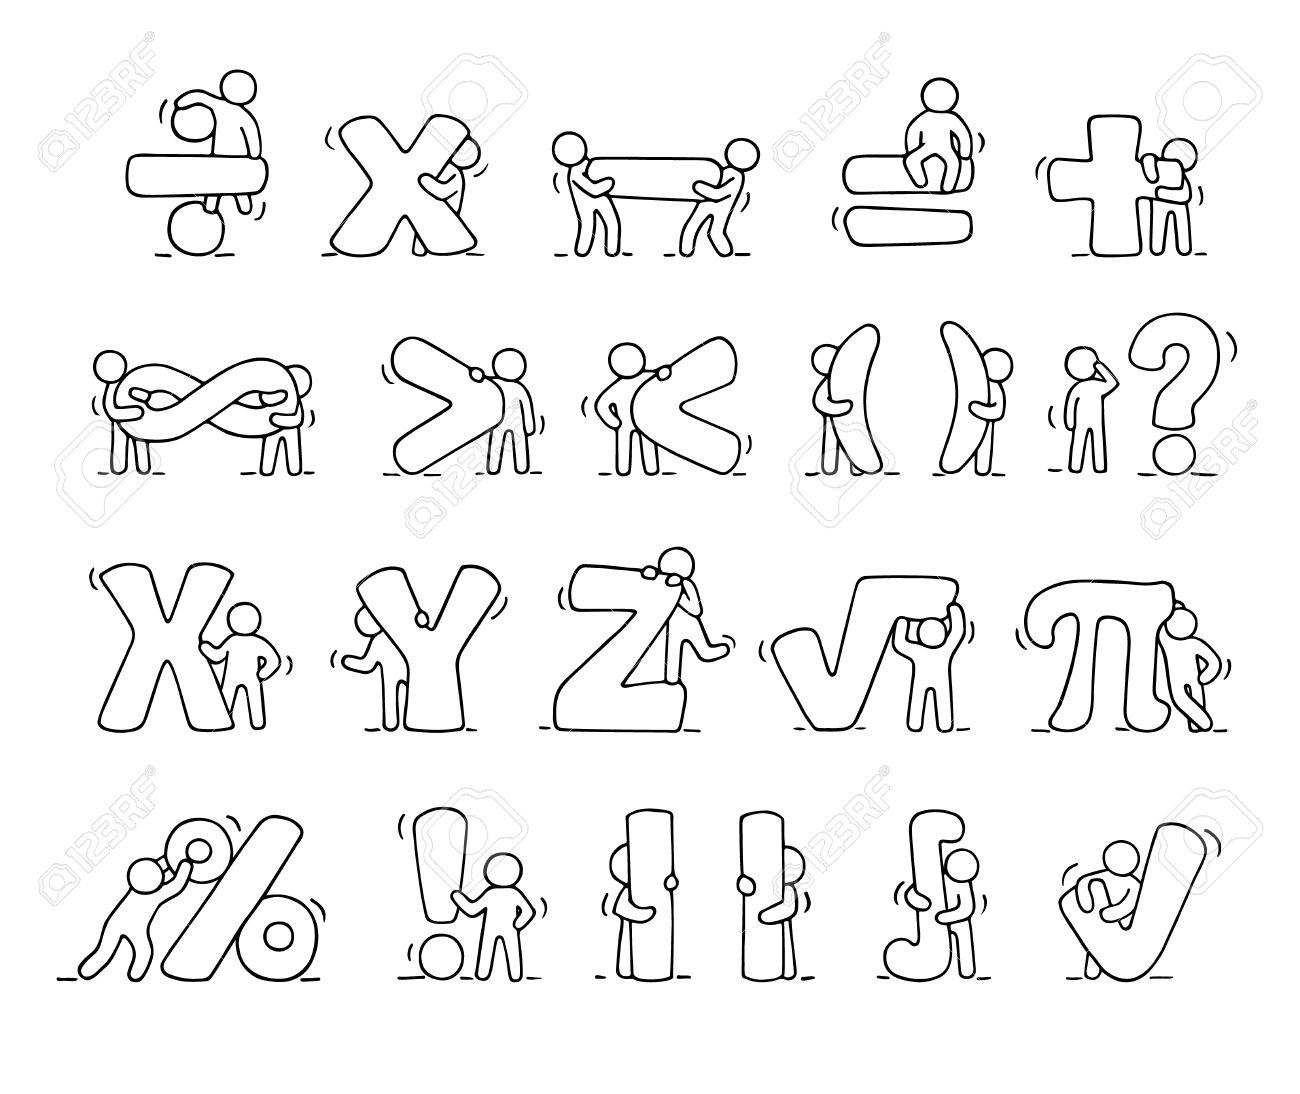 Iconos De Dibujos Animados Conjunto De Pequenos Croquis Personas Que